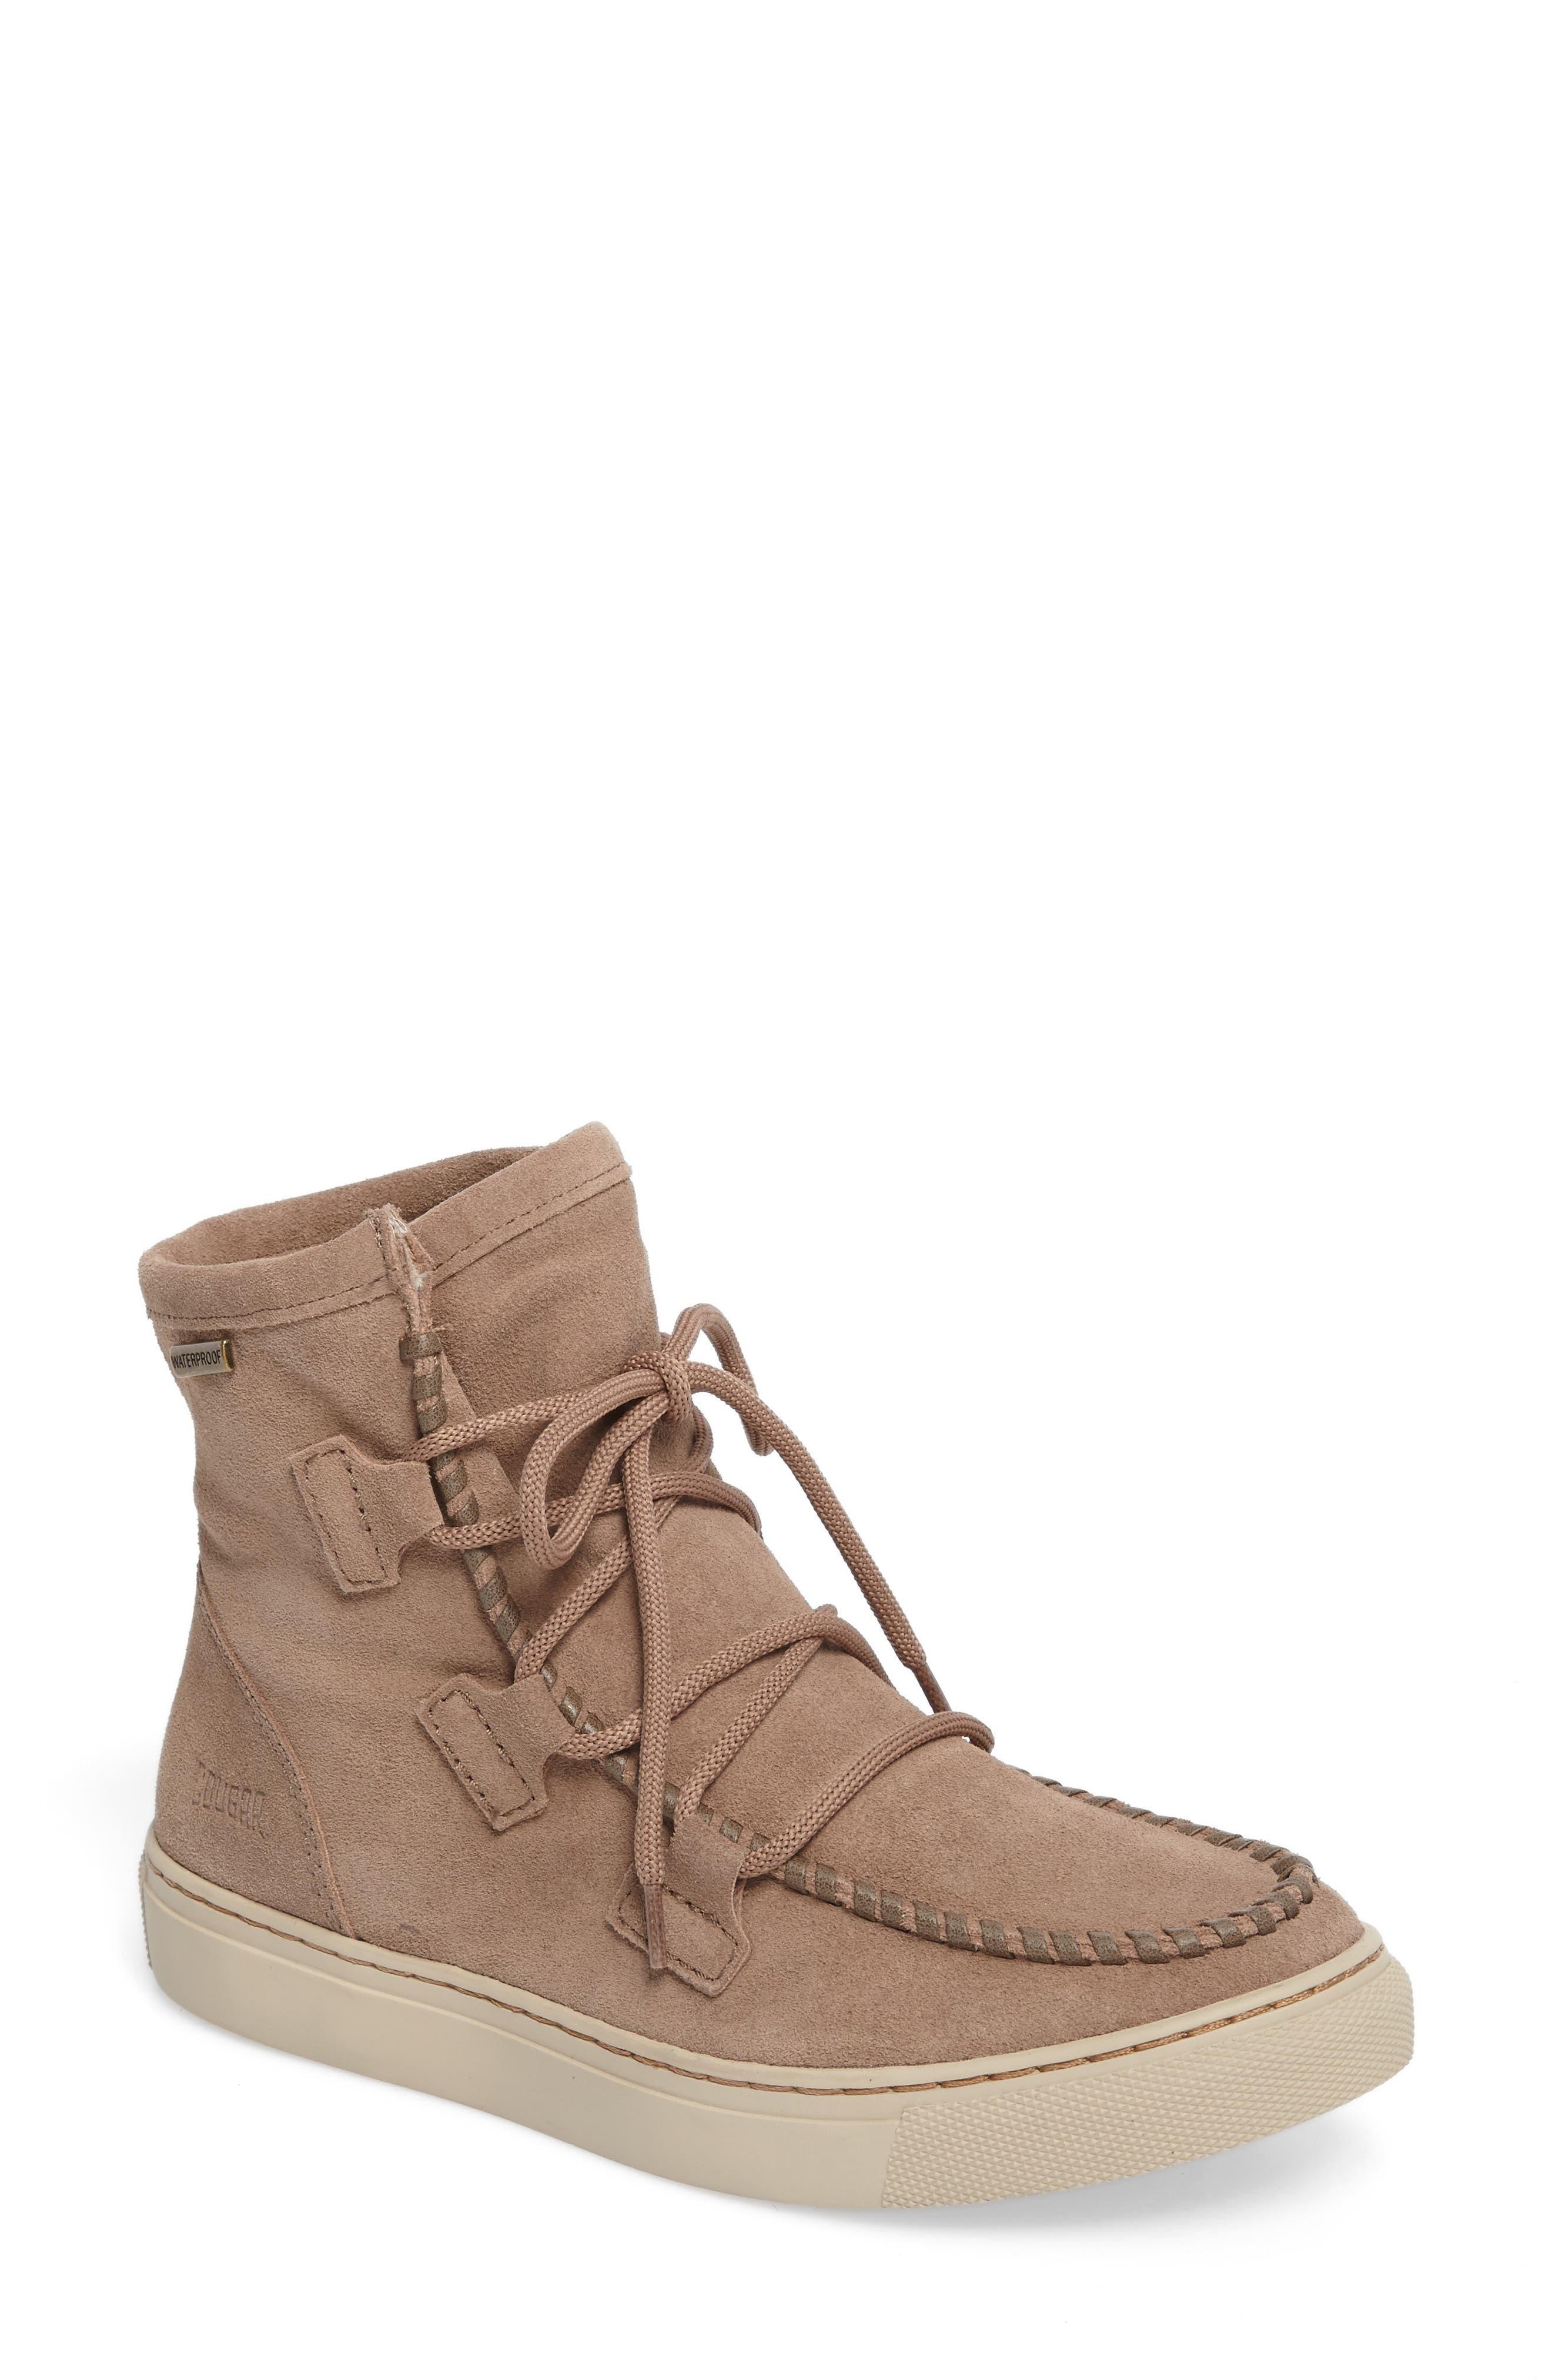 Fabiola Waterproof High Top Sneaker,                         Main,                         color, Taupe Suede